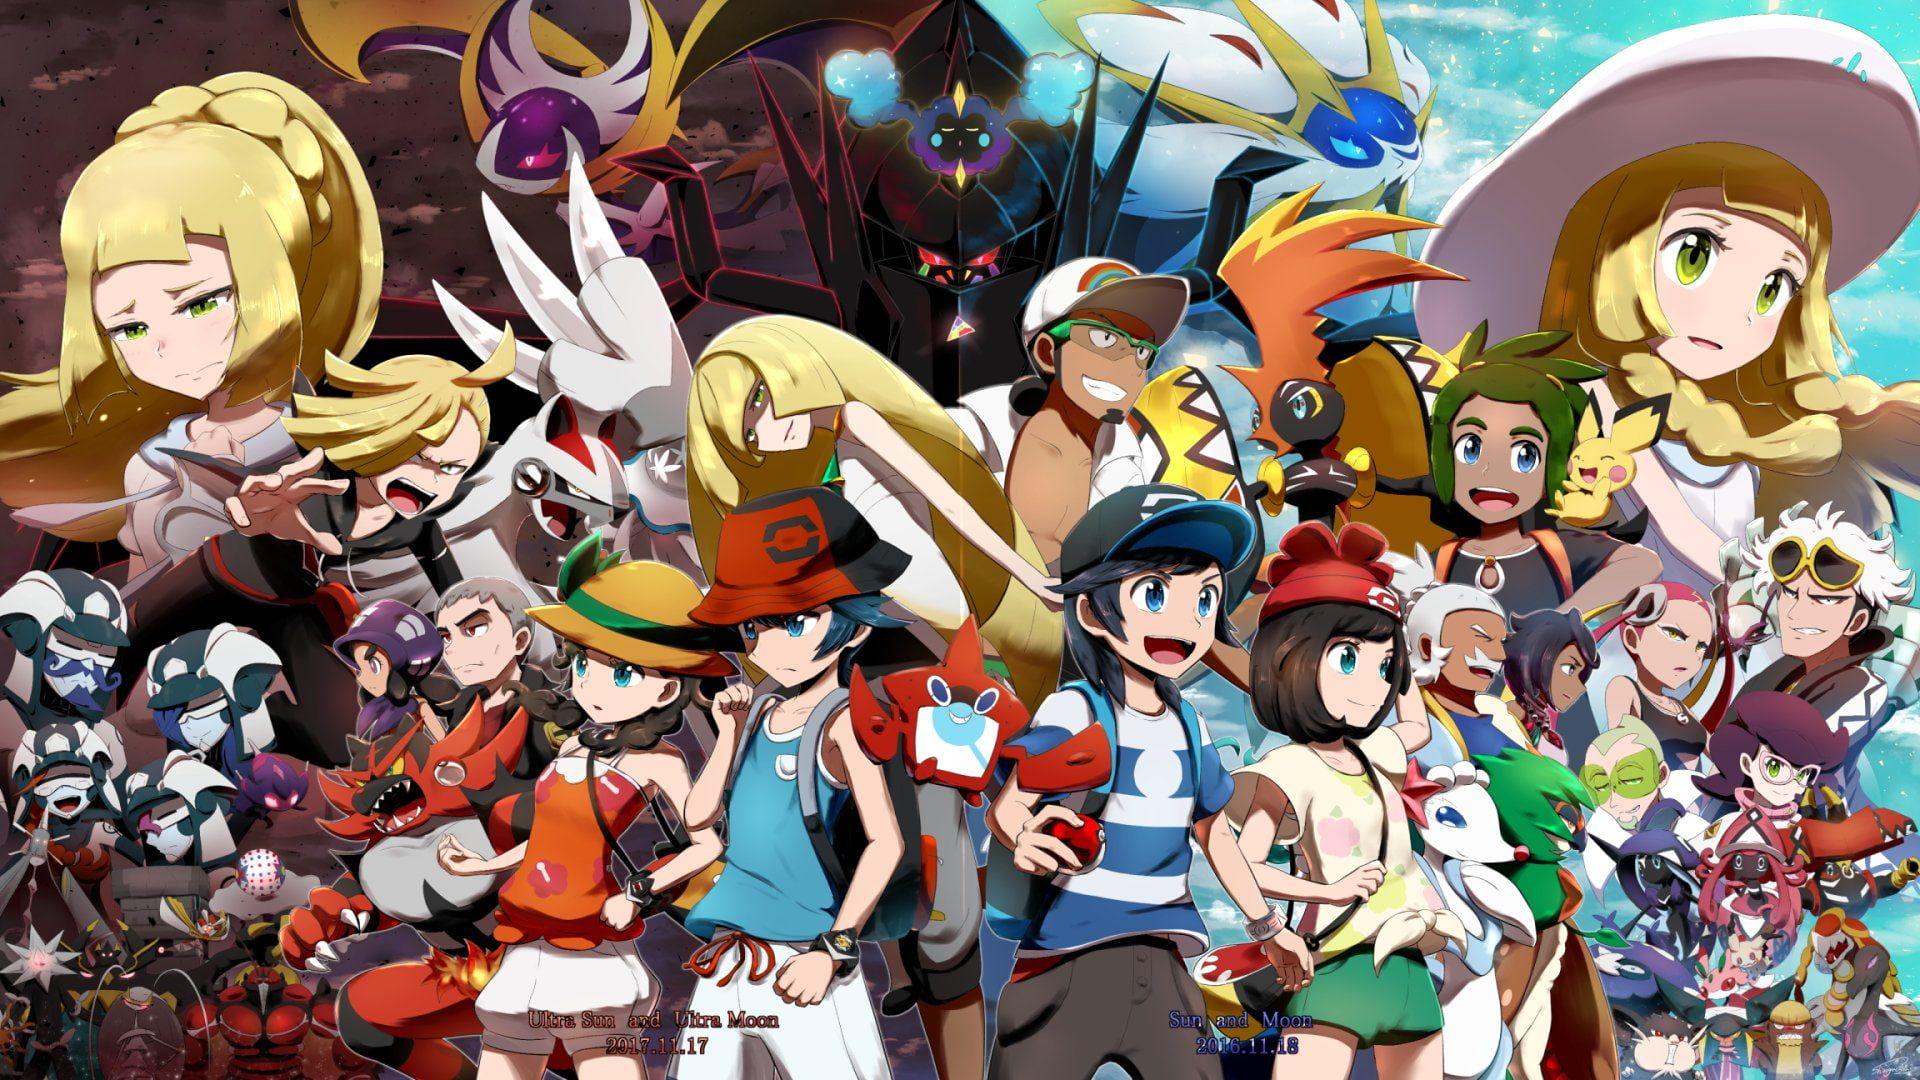 Pokemon Pokemon Ultra Sun And Ultra Moon Boy Girl 1080p Wallpaper Hdwallpaper Desktop Pokemon Moon Pokemon Pokemon Alola